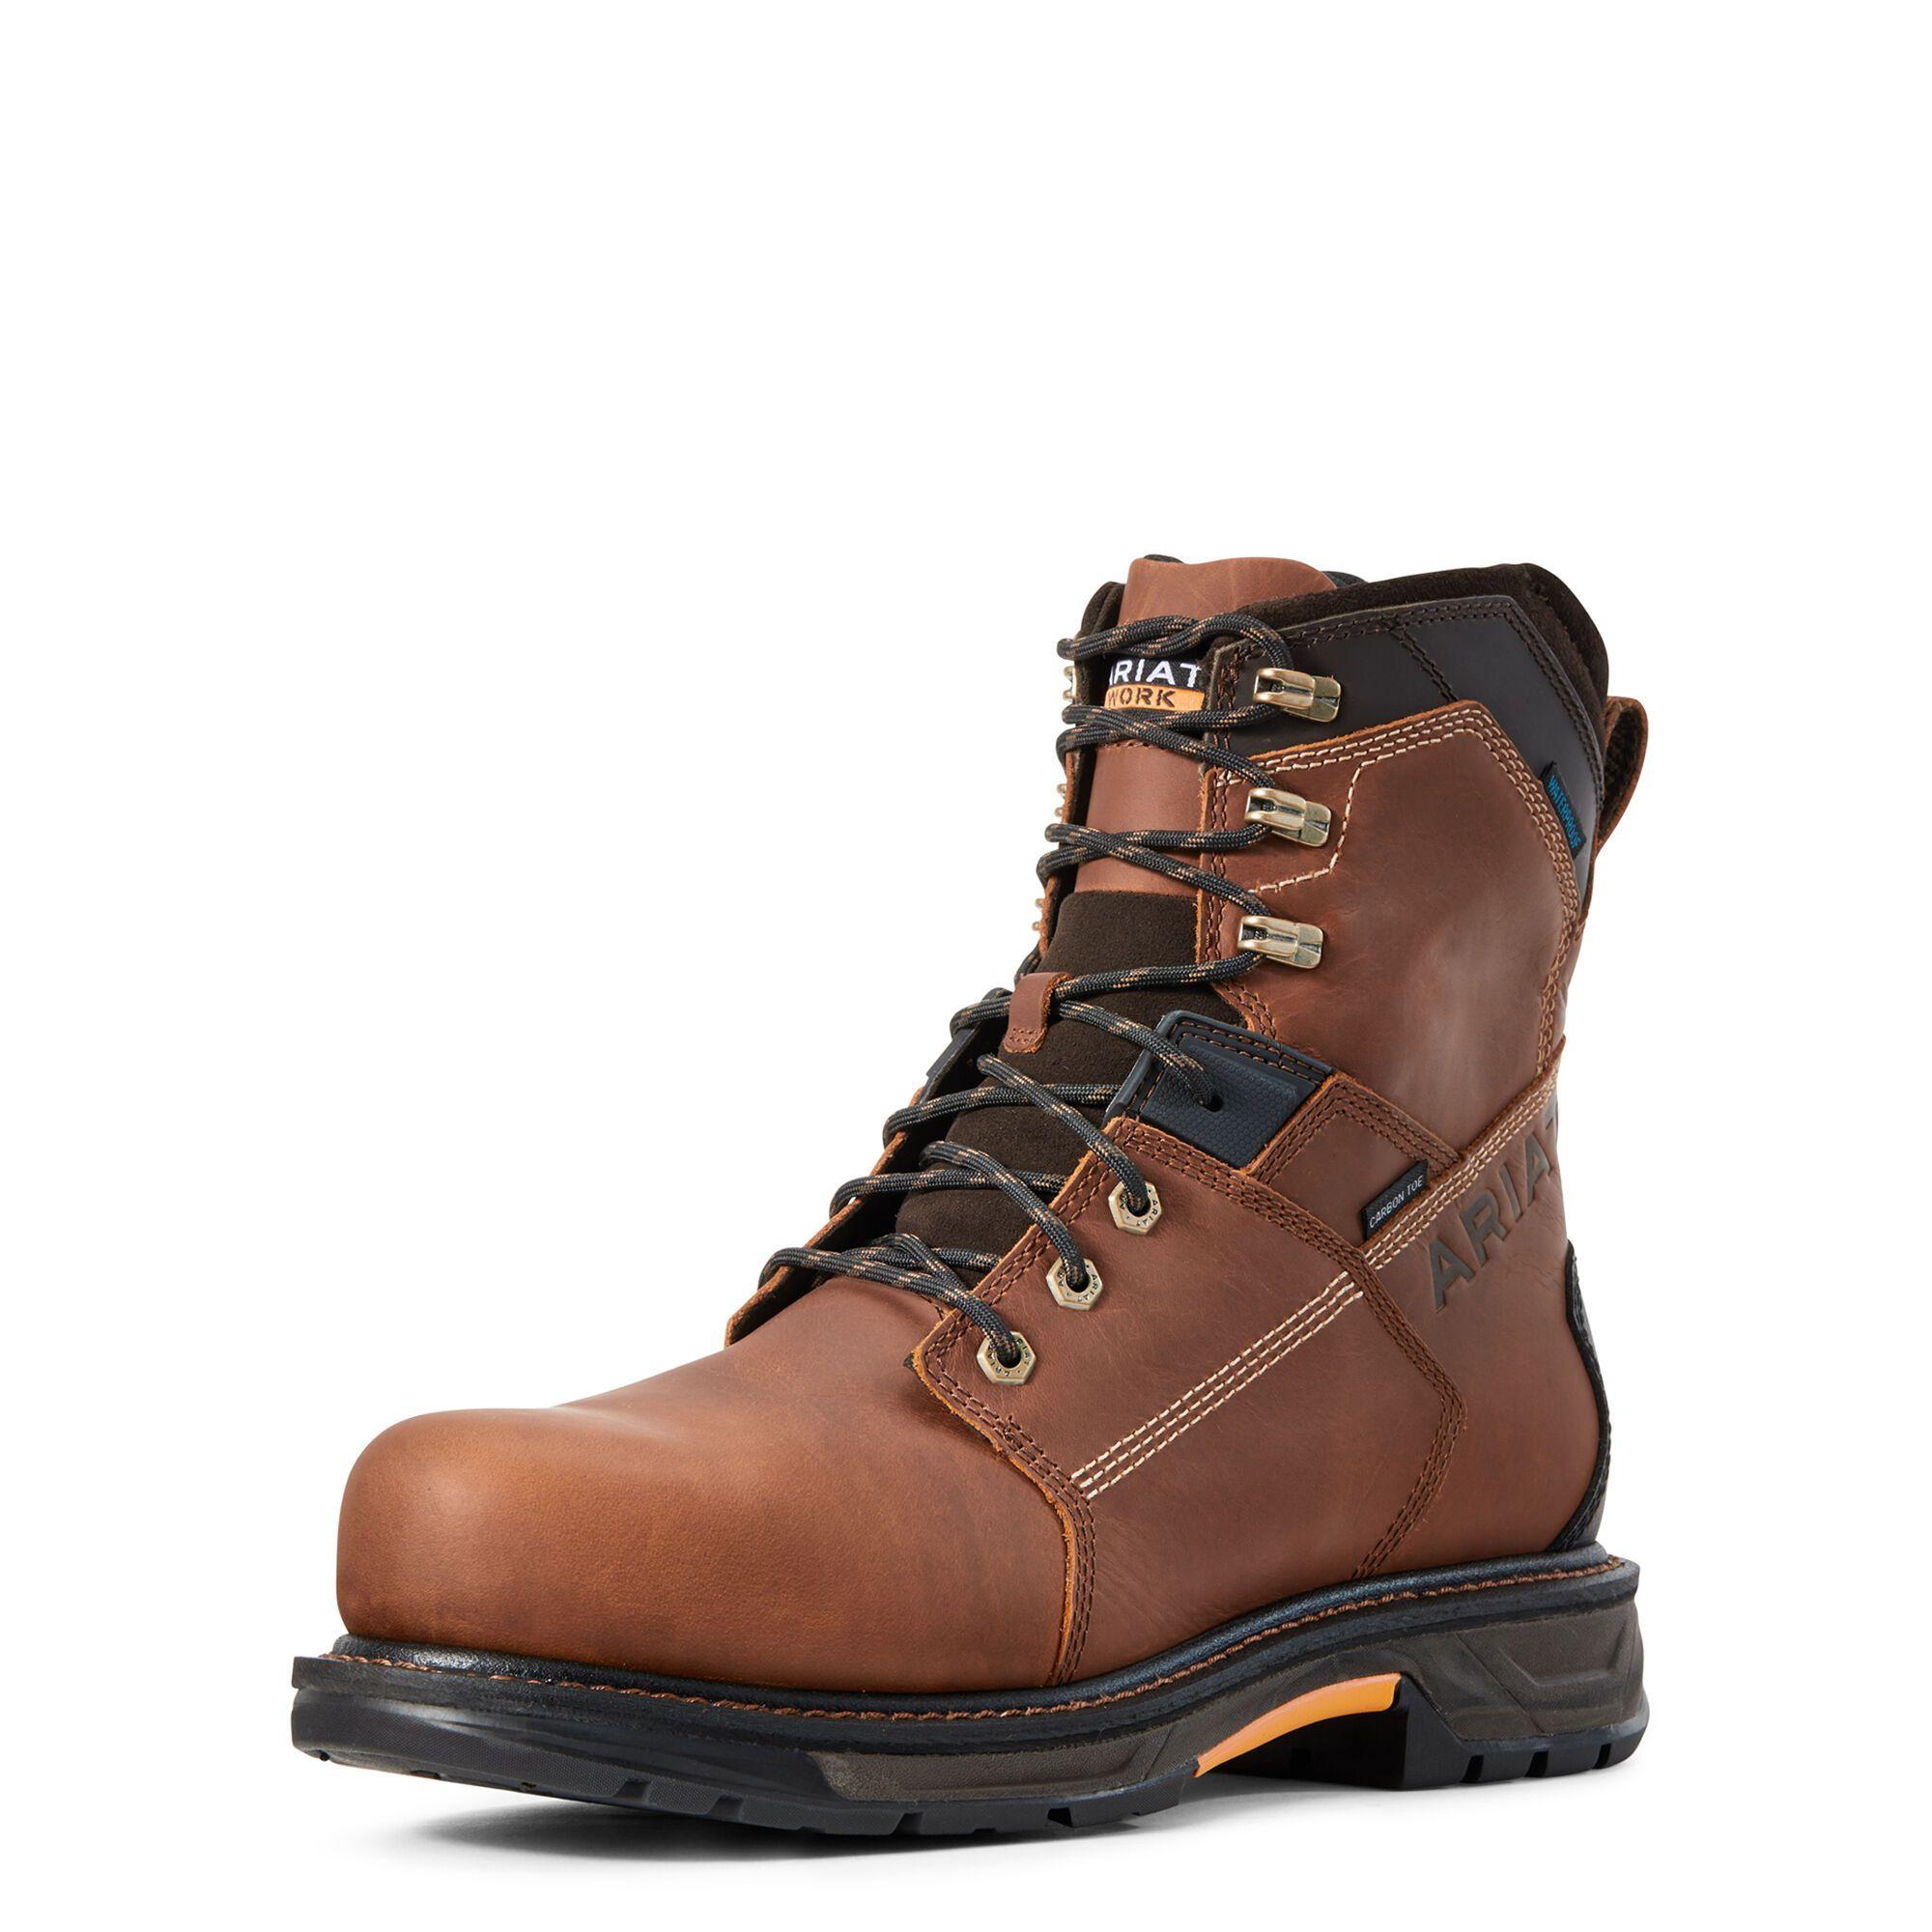 "WorkHog XT 8"" Waterproof Carbon Toe Work Boot Boots"